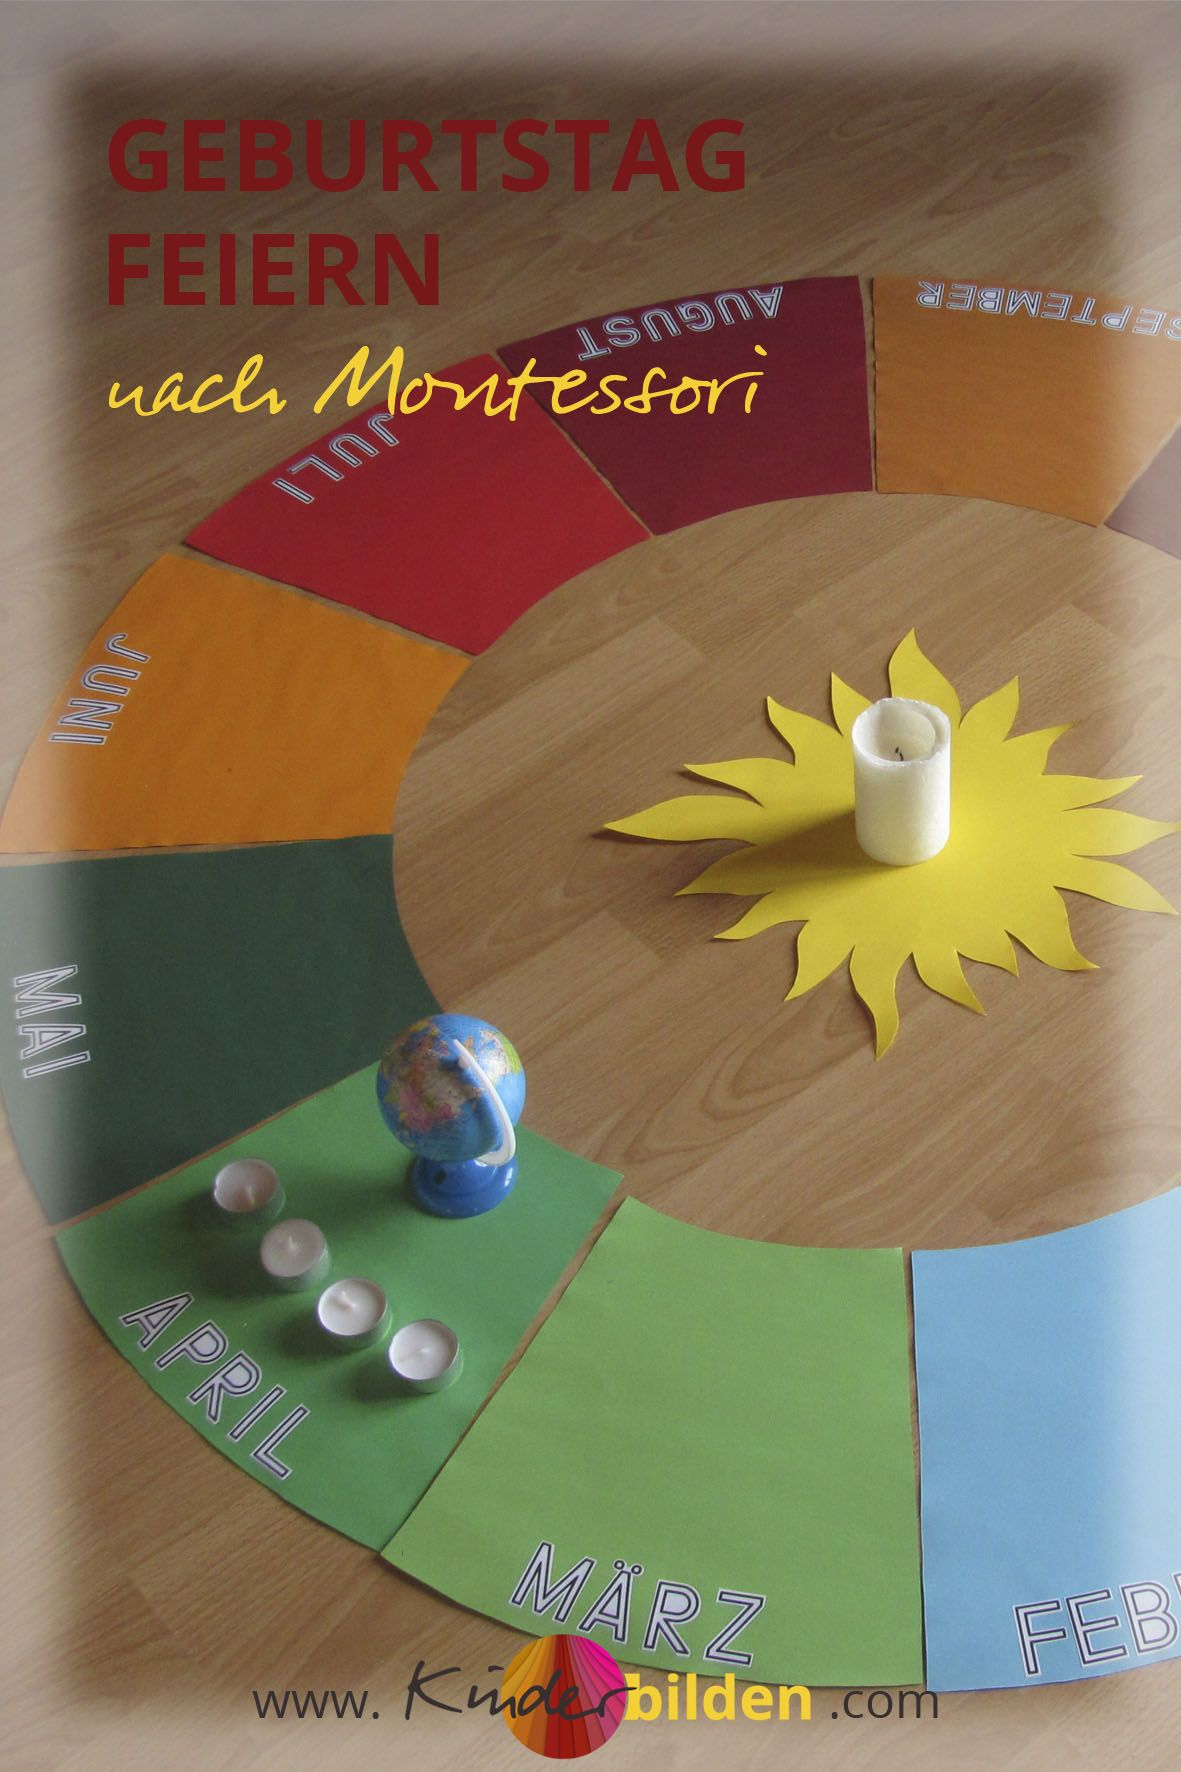 Kinder geburtstag ritual montessori jahreskreis diy lebenskreis lebensbuch geburtstag - Ideen geburtstagsfeier ...